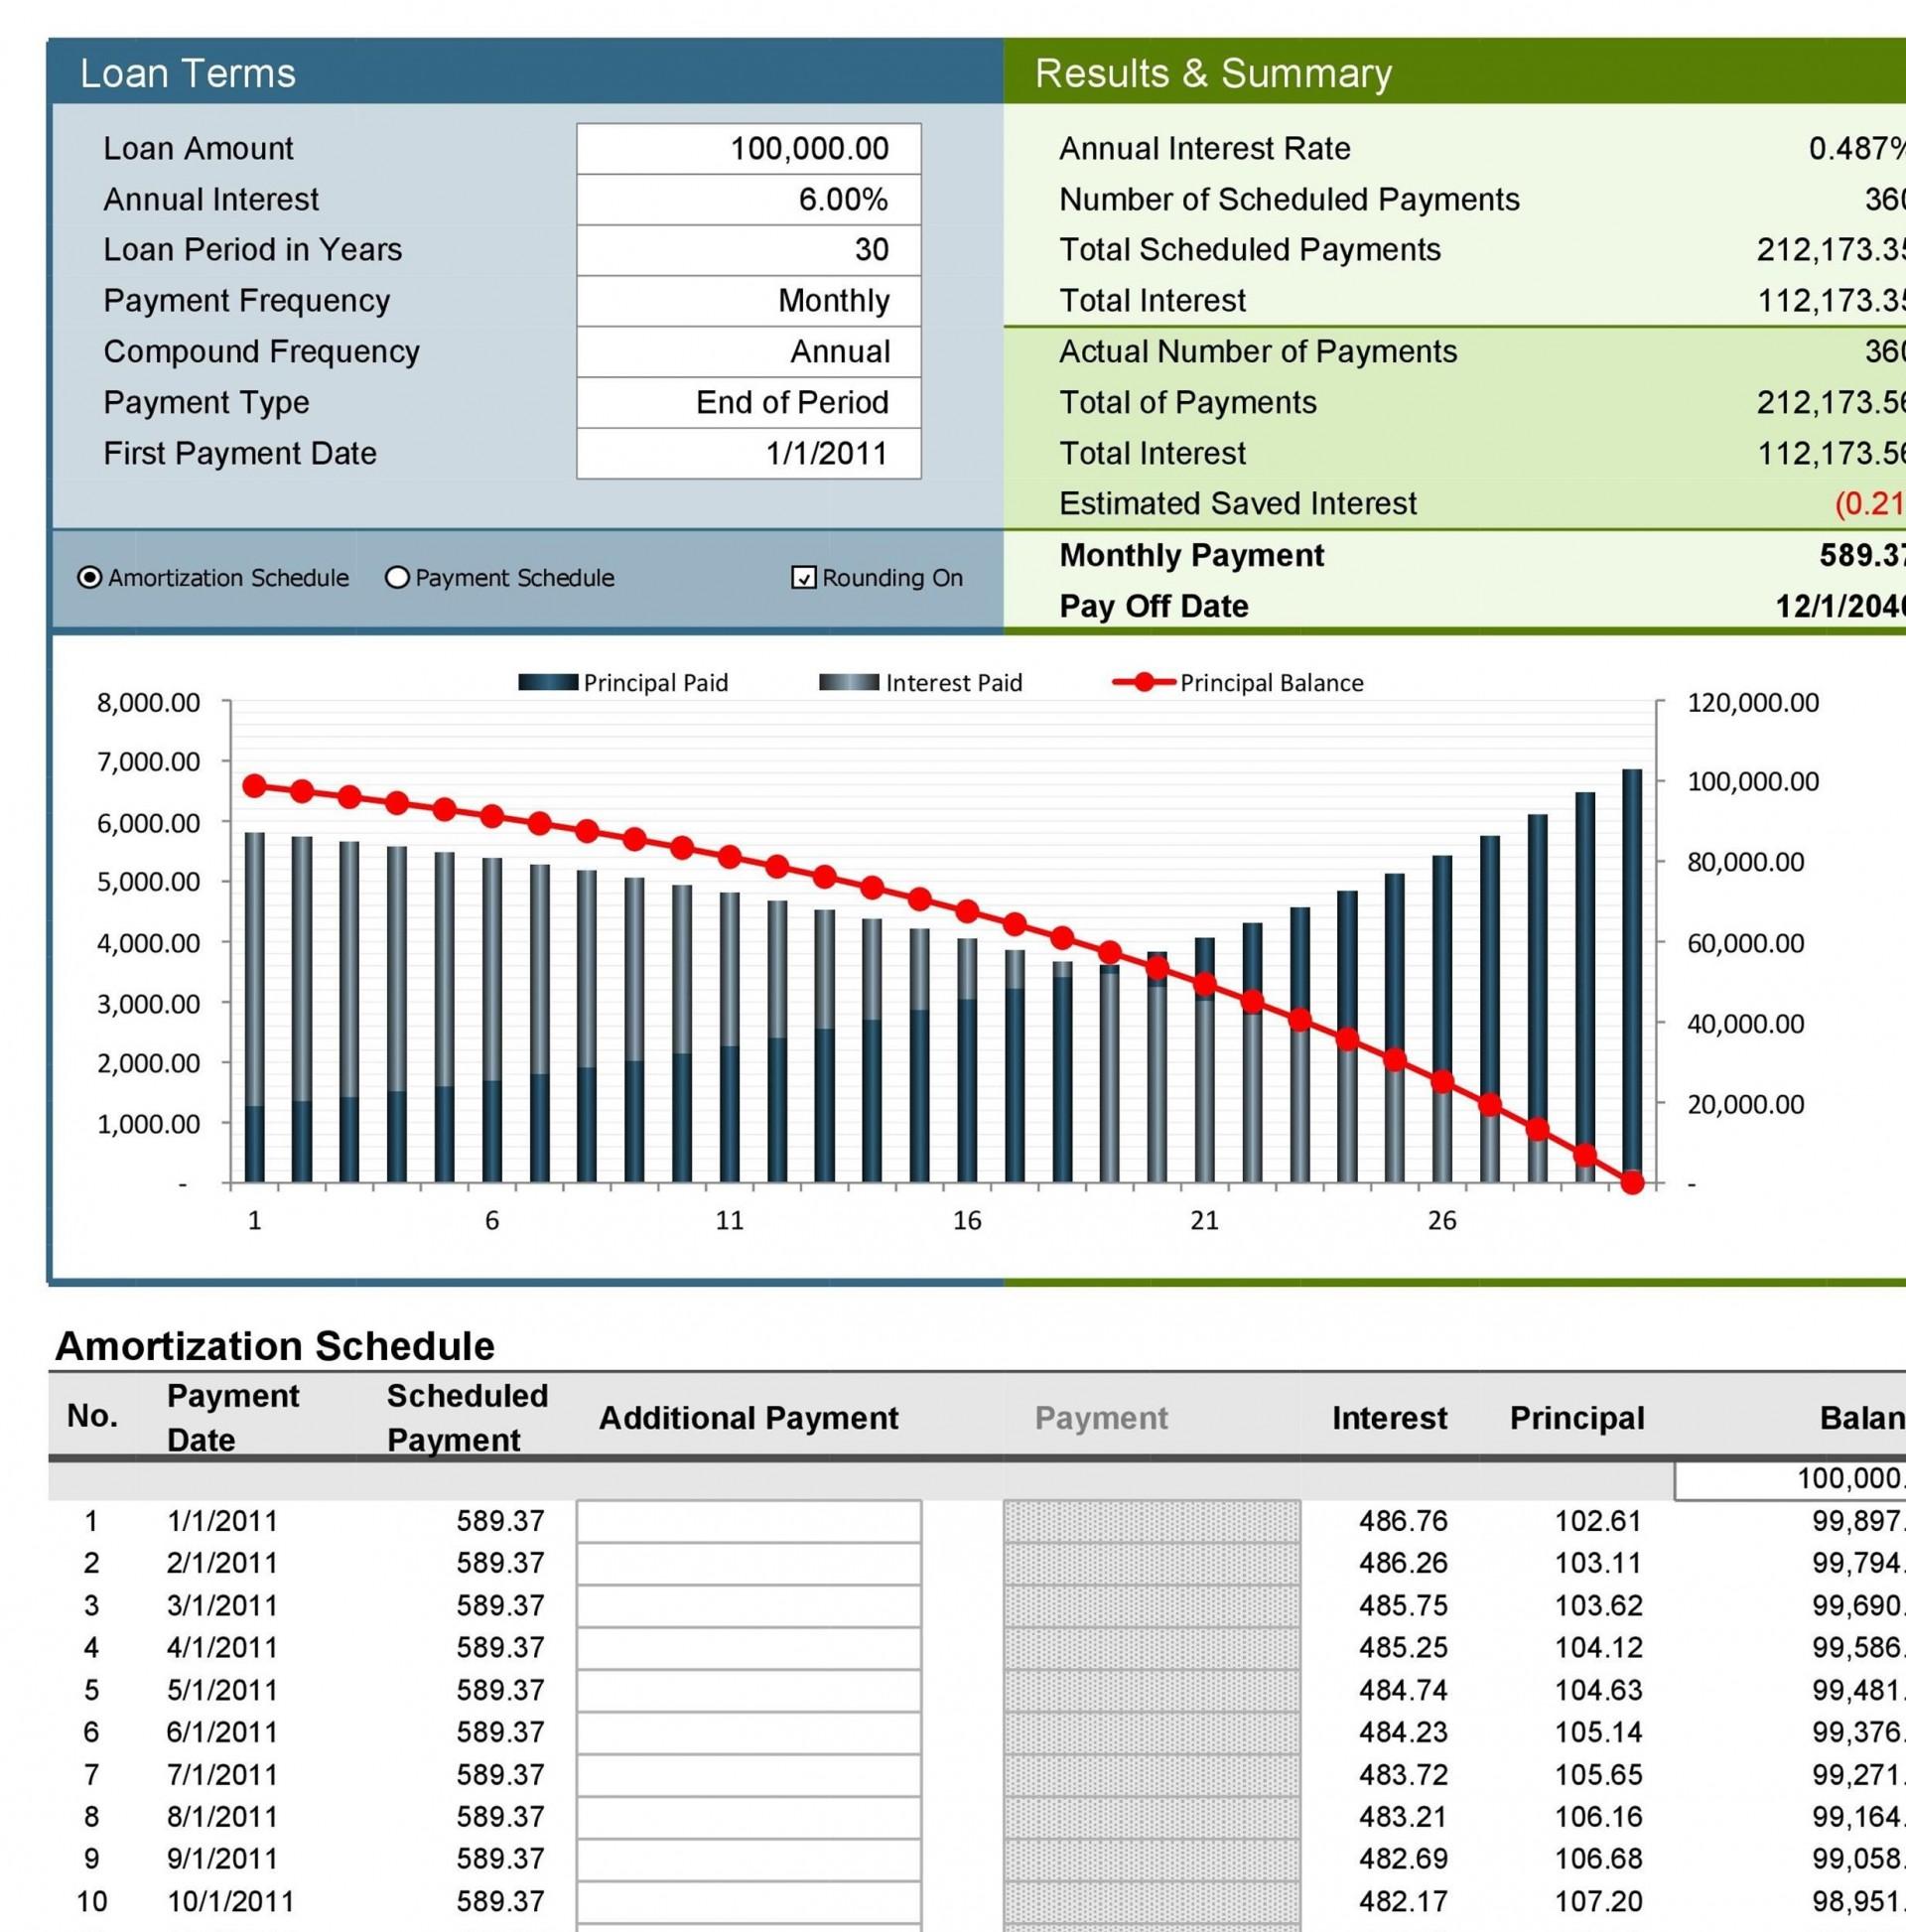 008 Unique Loan Amortization Excel Template Picture  Schedule 2010 Free 20071920